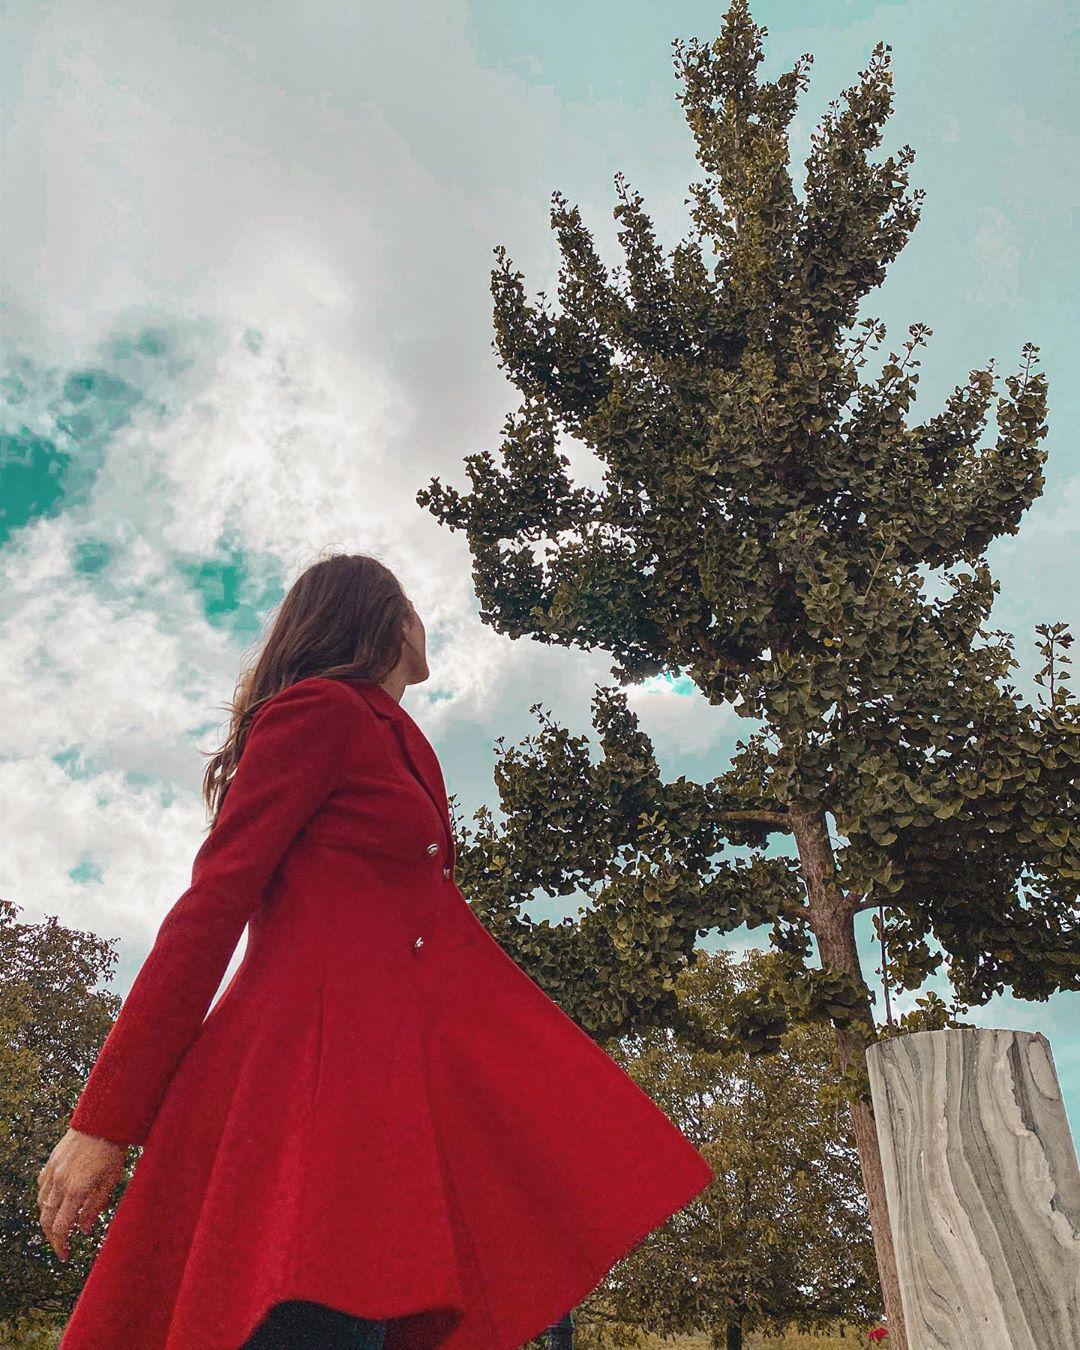 Diana Del Bufalo torna single: finita la storia con Edoardo Tavassi